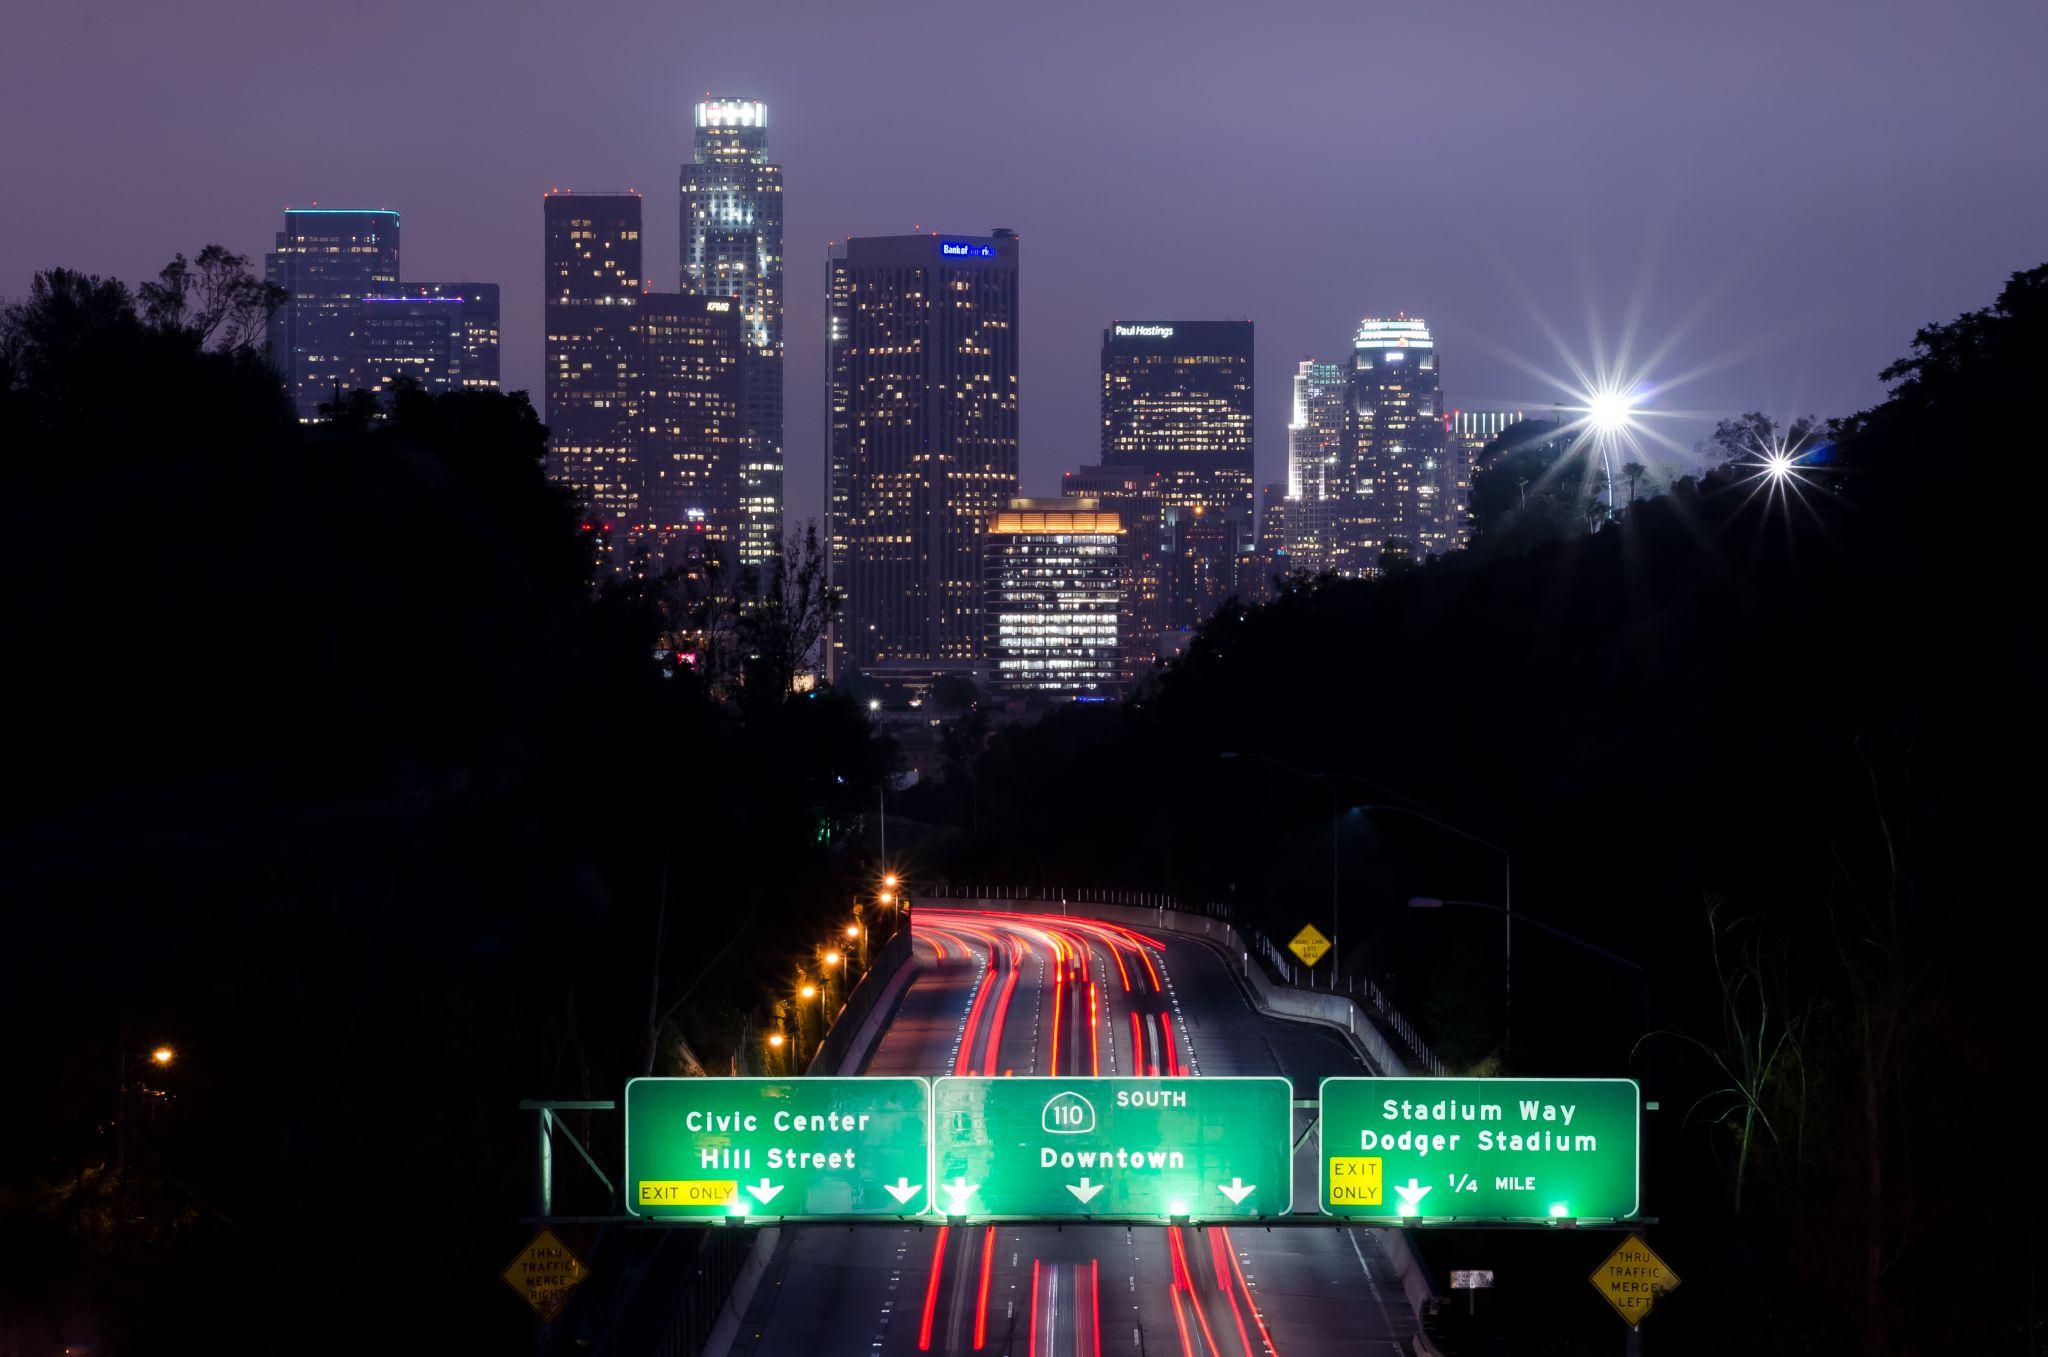 4th Street Bridge, Los Angeles, USA